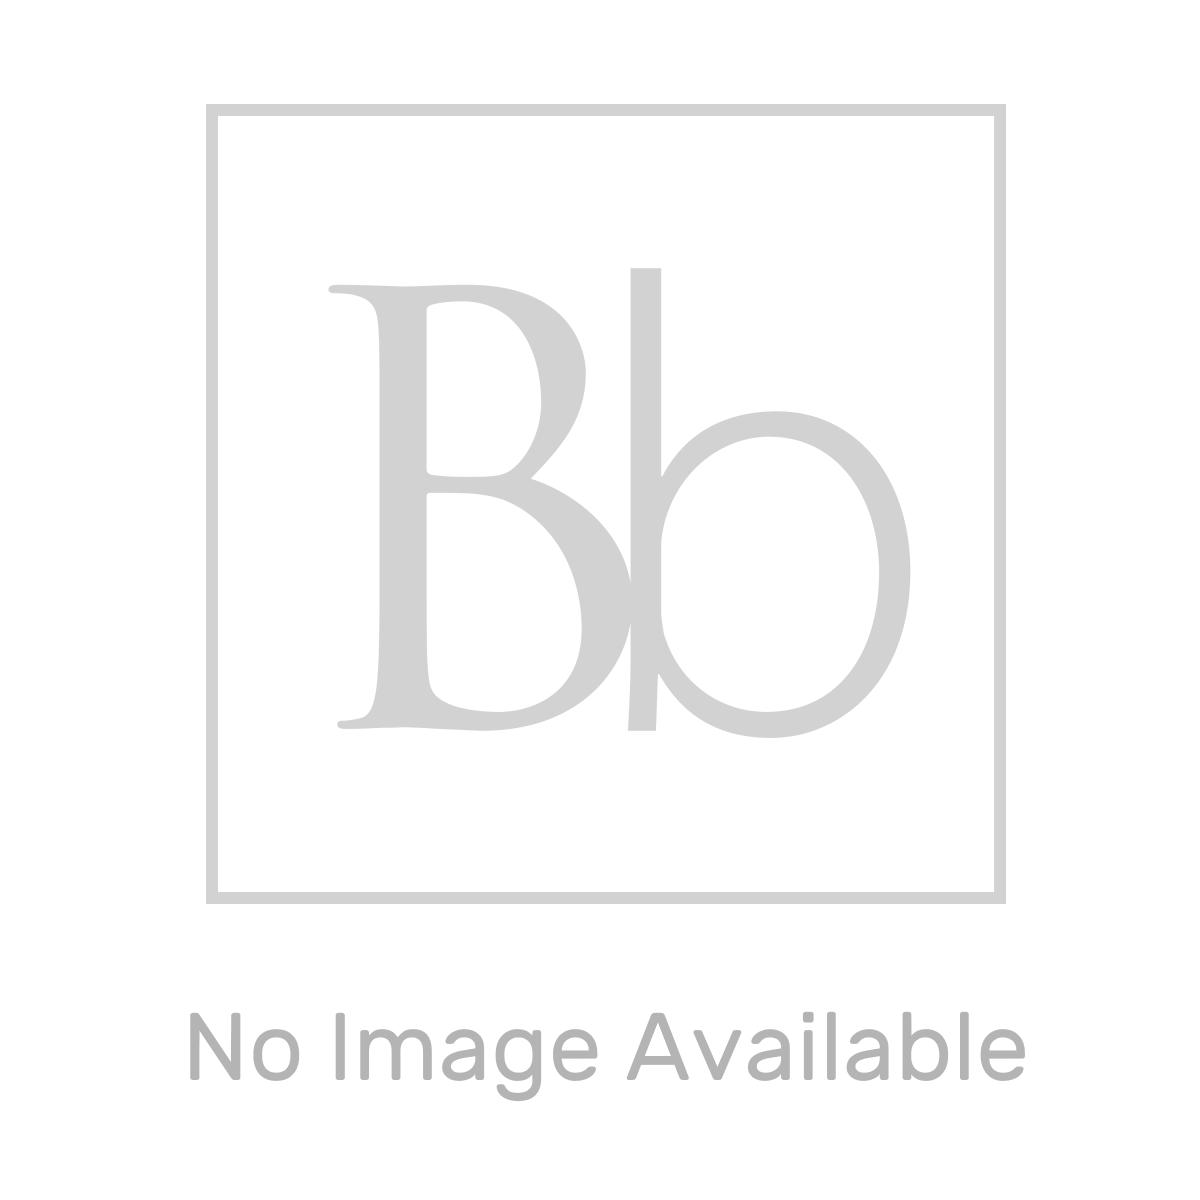 Sensio Ainsley Single Diffused LED Mirrored Cabinet